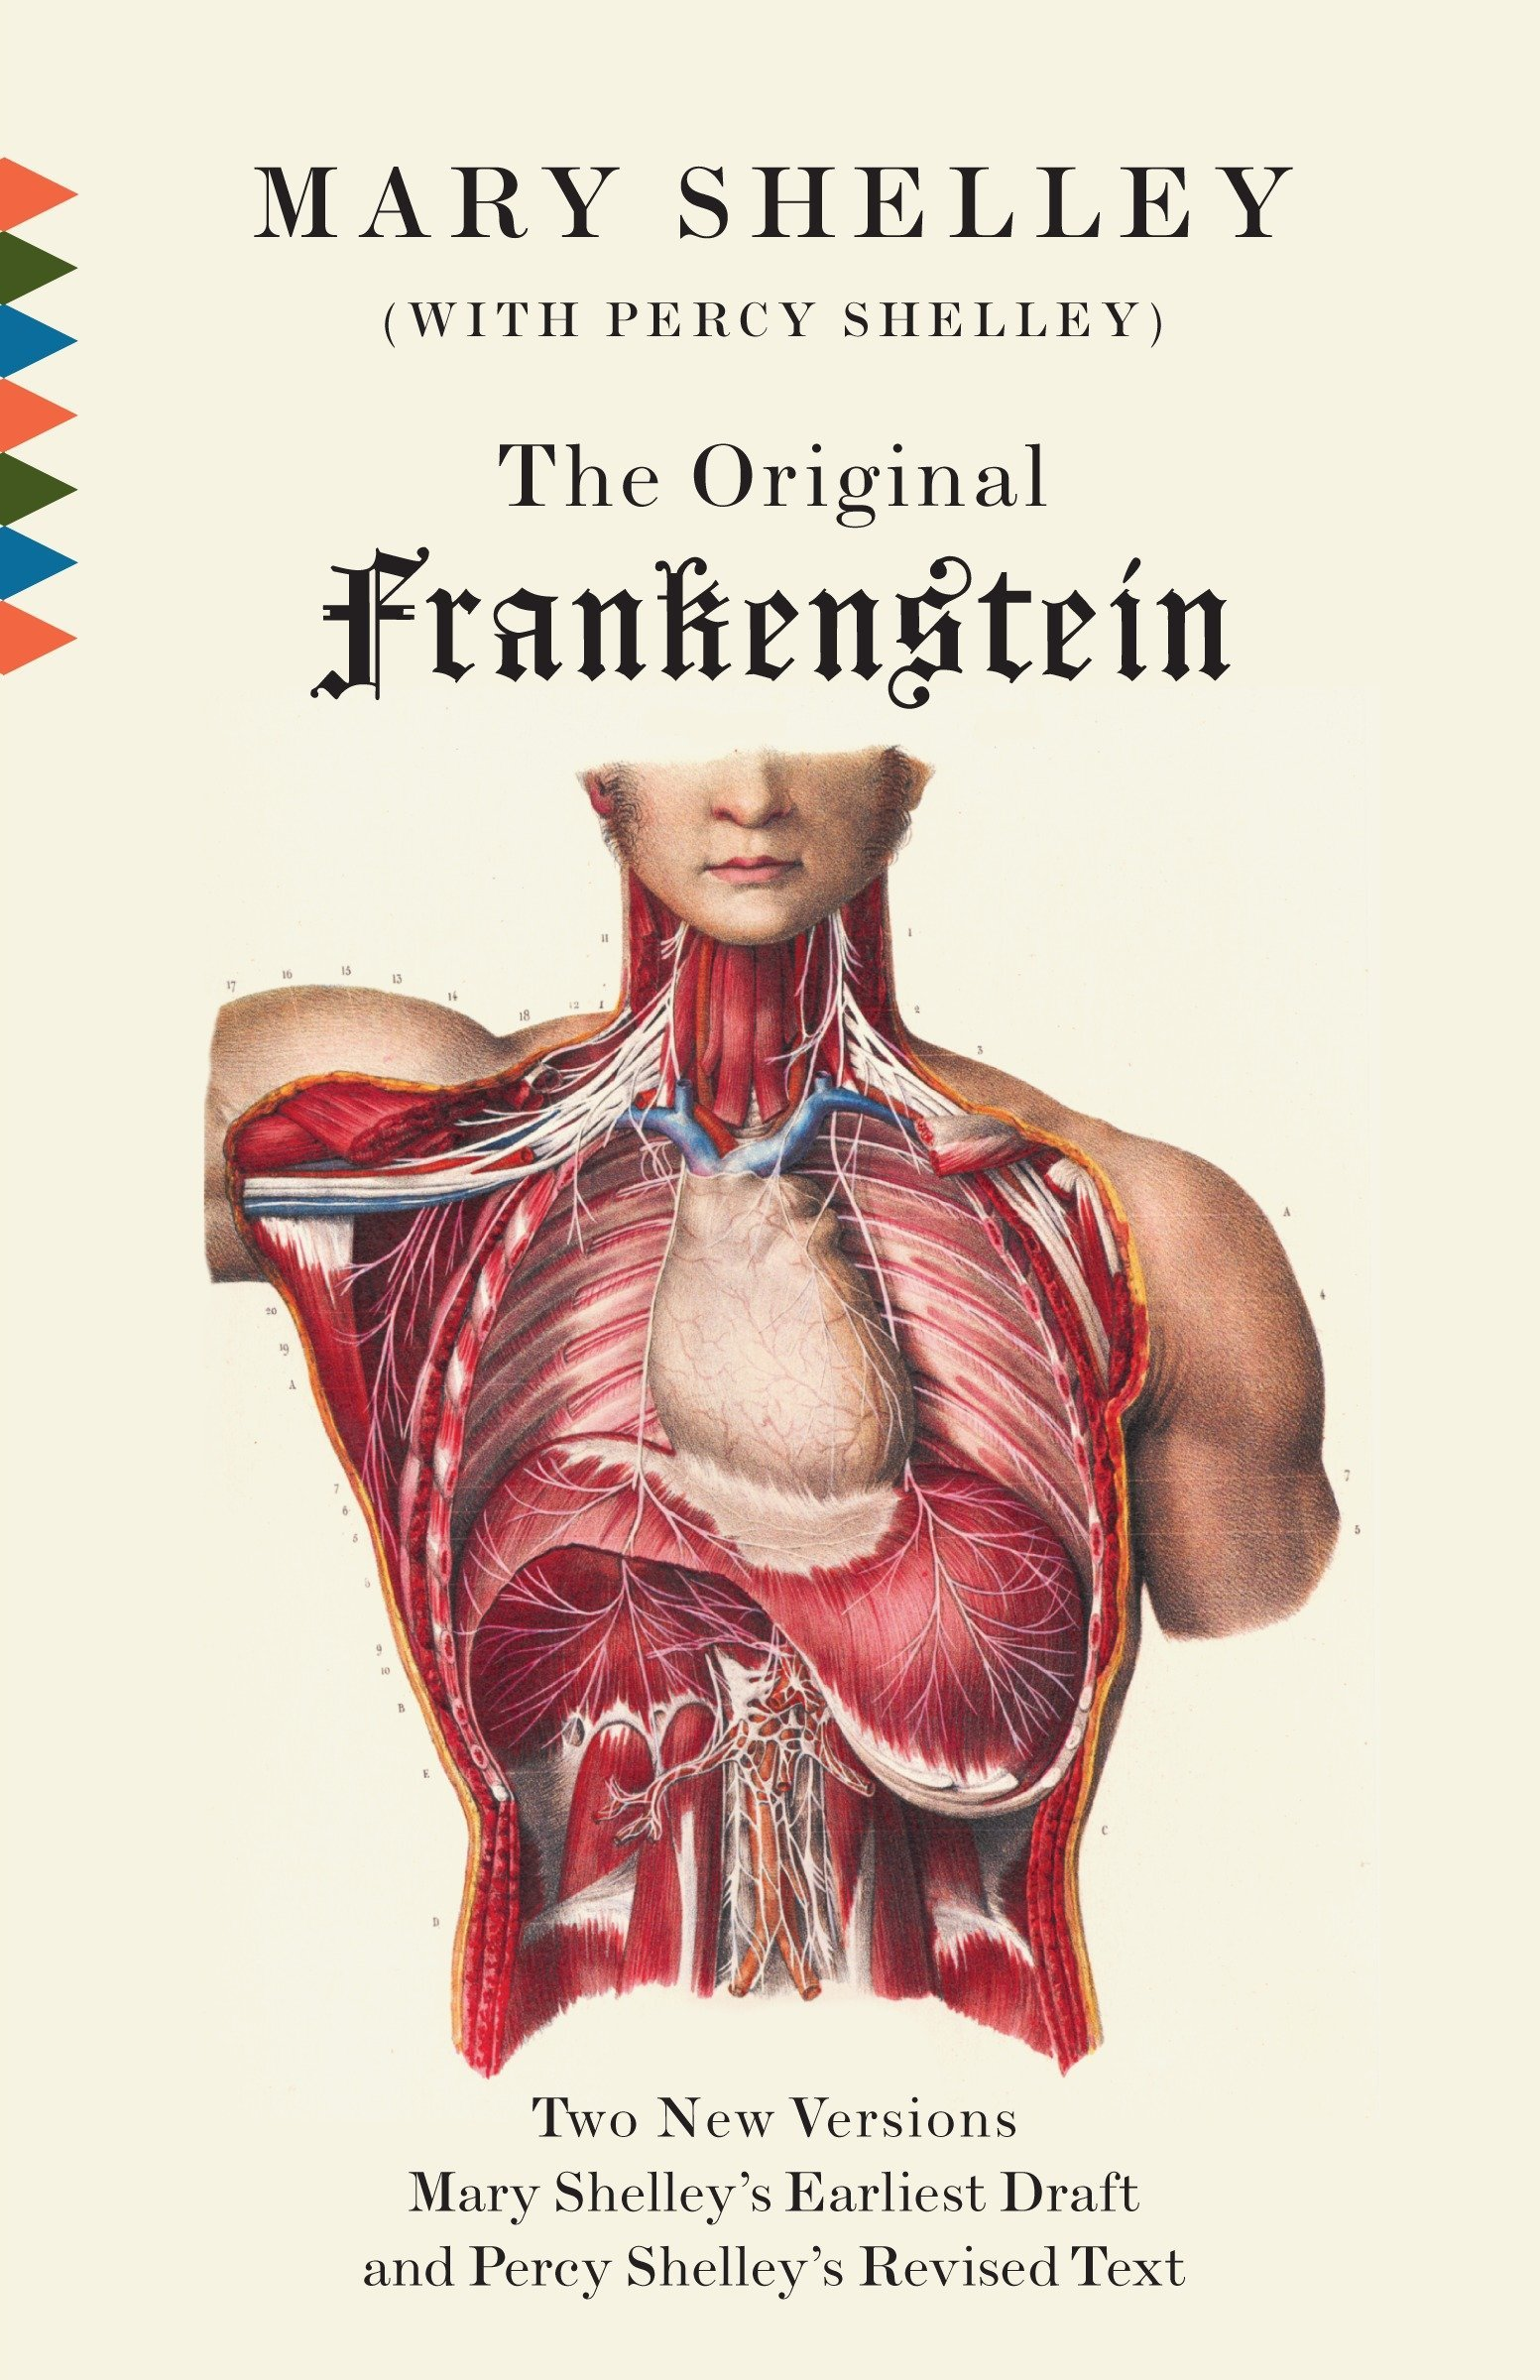 The Original Frankenstein (Vintage Classics): Mary Shelley, Charles E.  Robinson, Percy Bysshe Shelley: 9780307474421: Amazon.com: Books